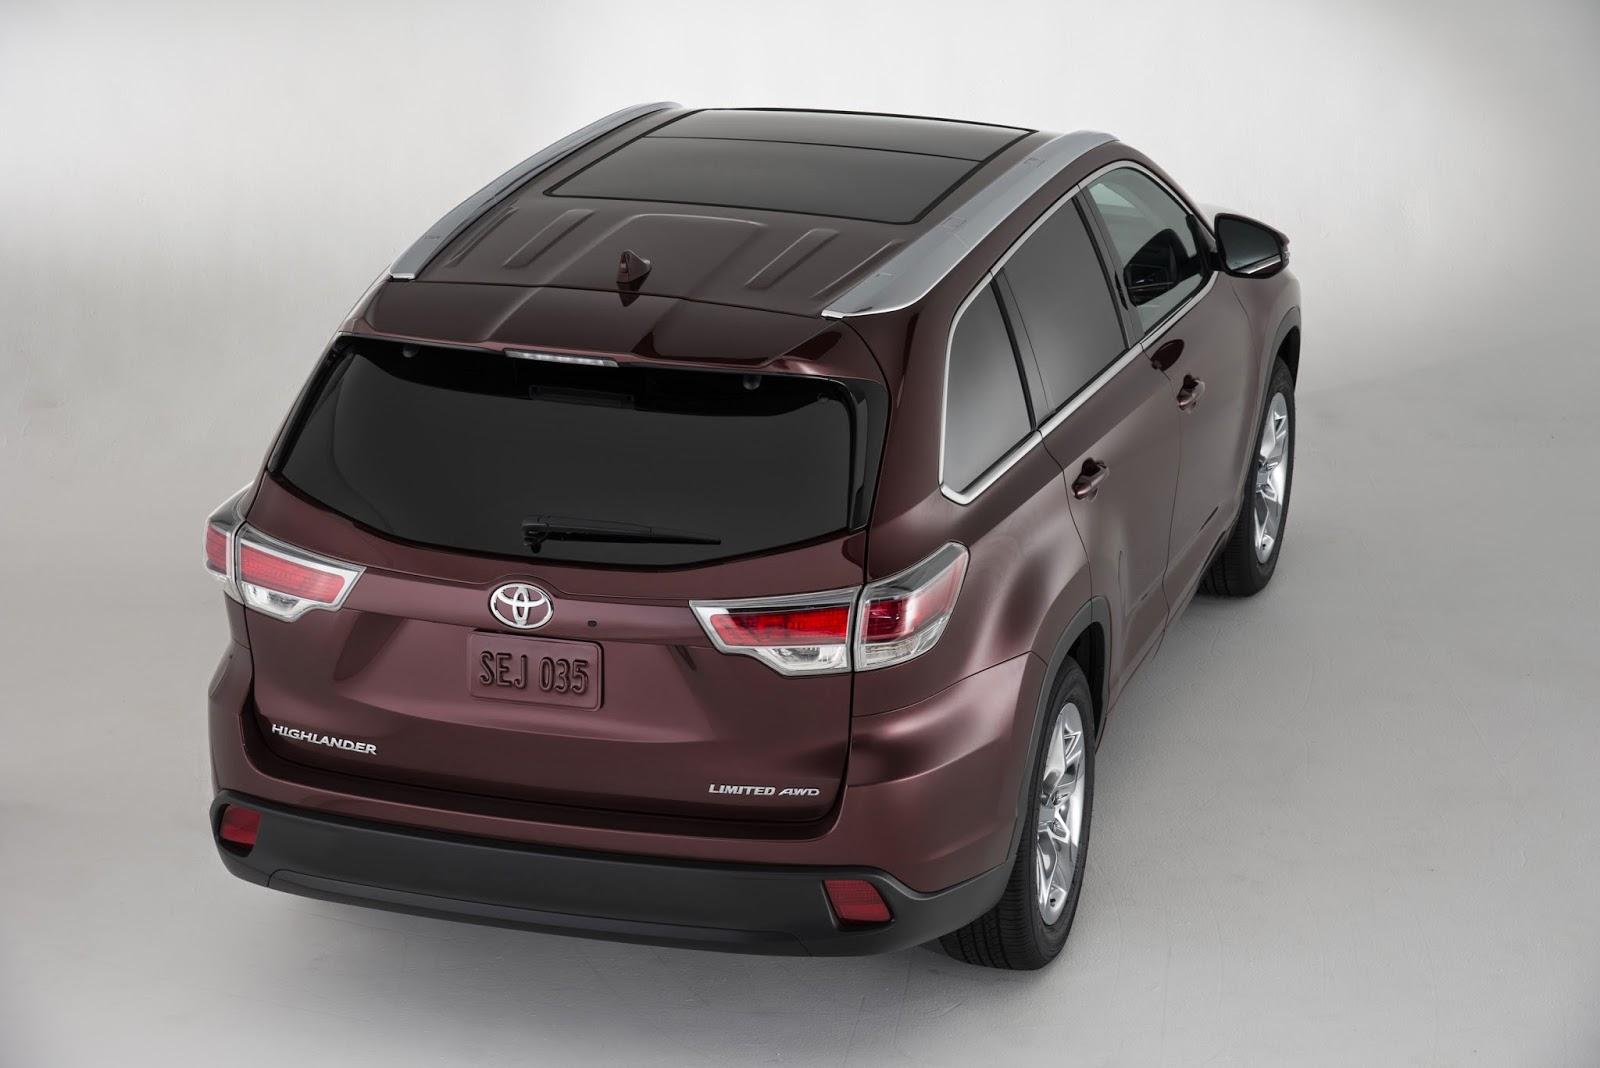 Rear 3/4 view of 2014 Toyota Highlander